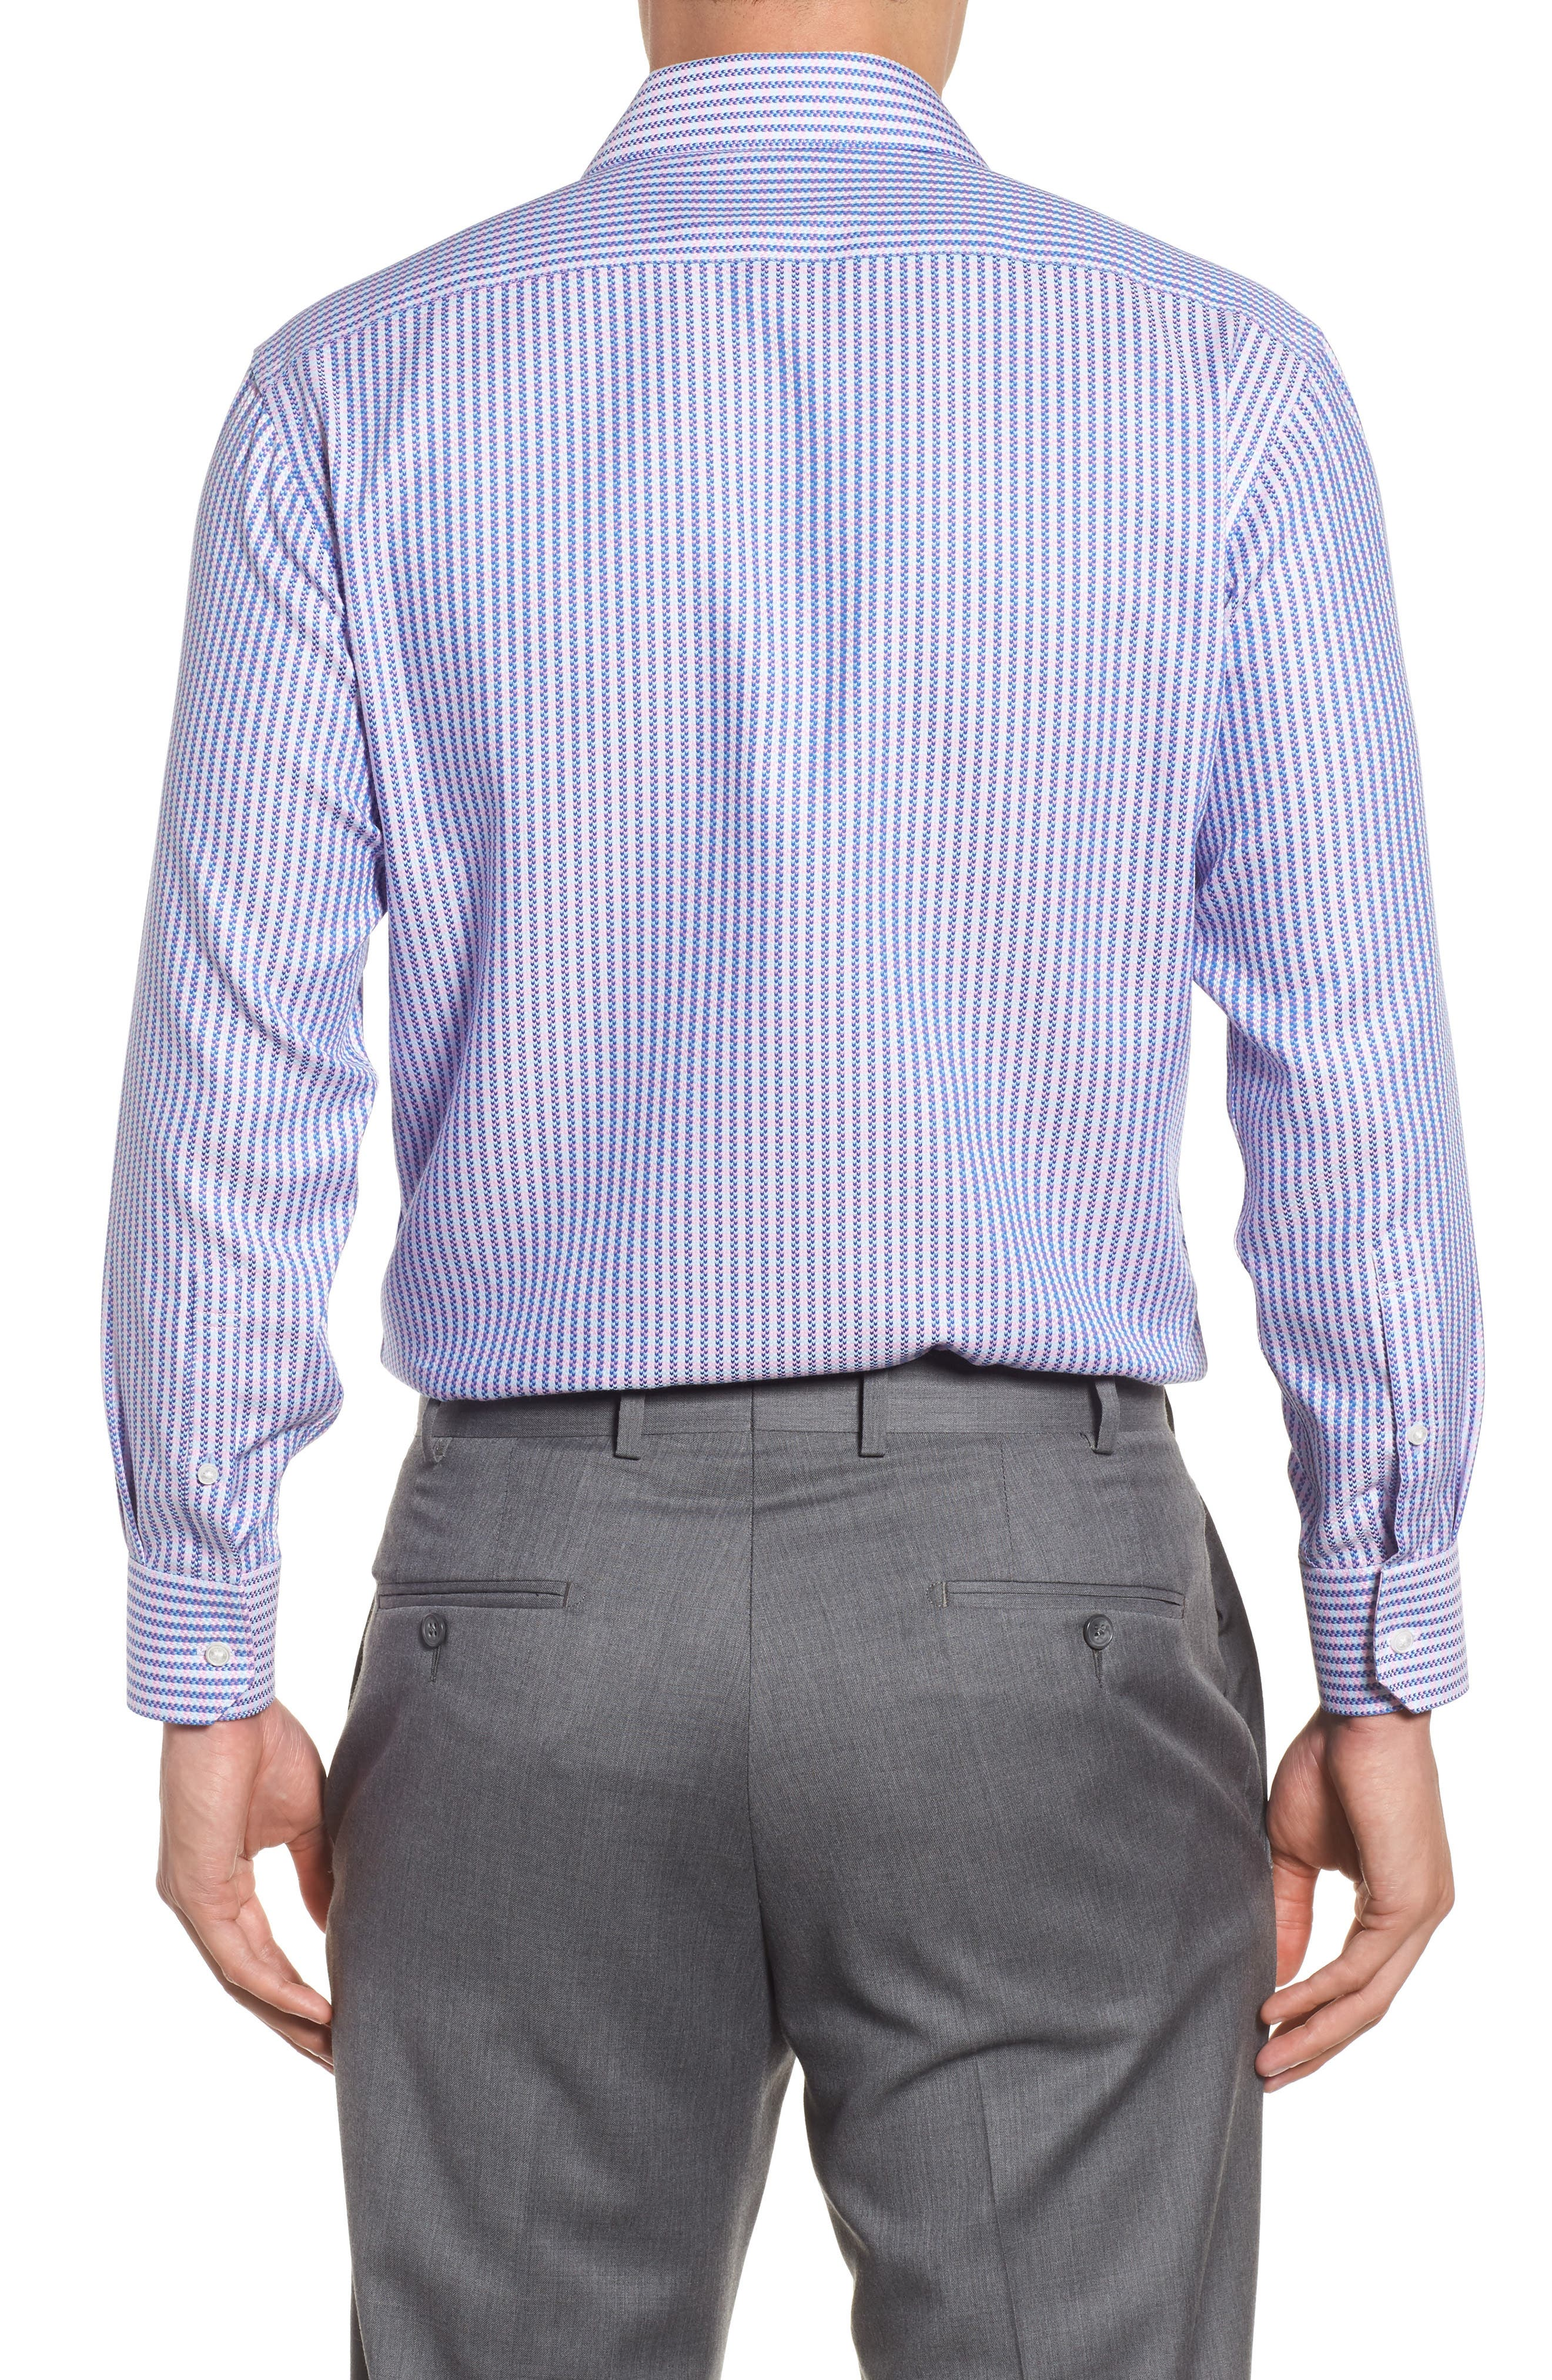 Trim Fit Stripe Dress Shirt,                             Alternate thumbnail 2, color,                             650